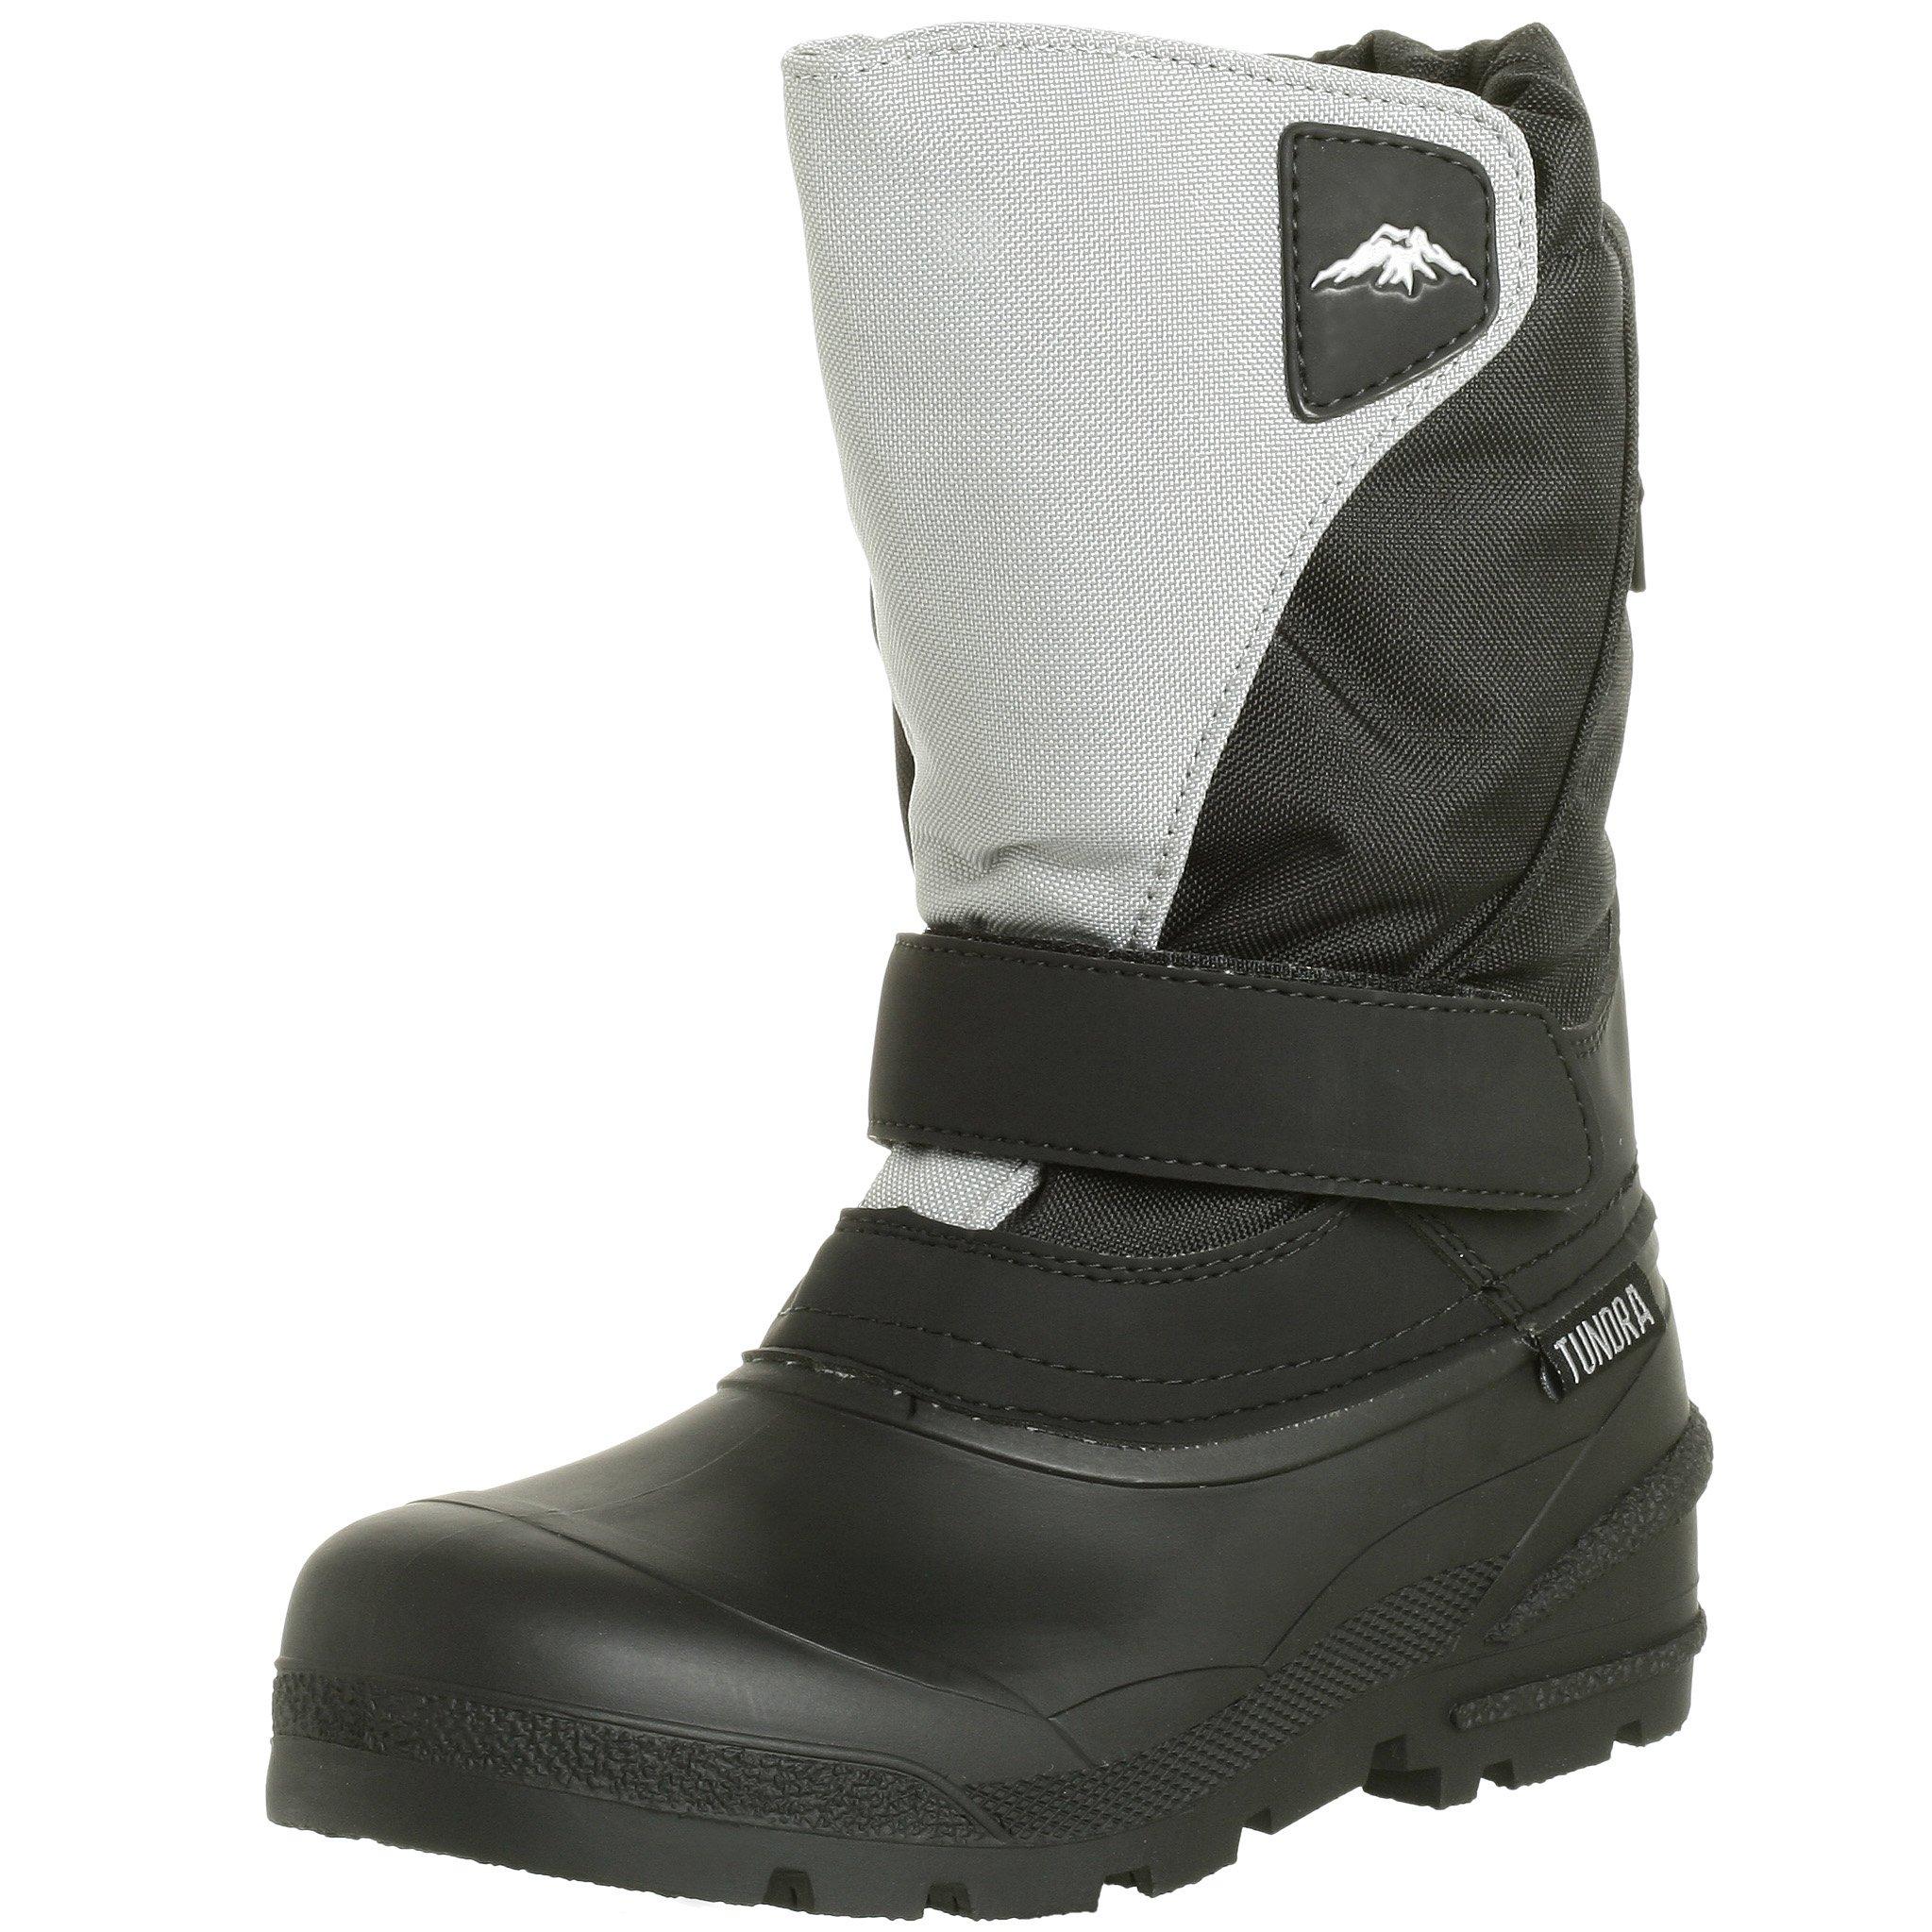 Tundra Quebec Child Winter Boots, Black/Grey, 4 M US Big Kid